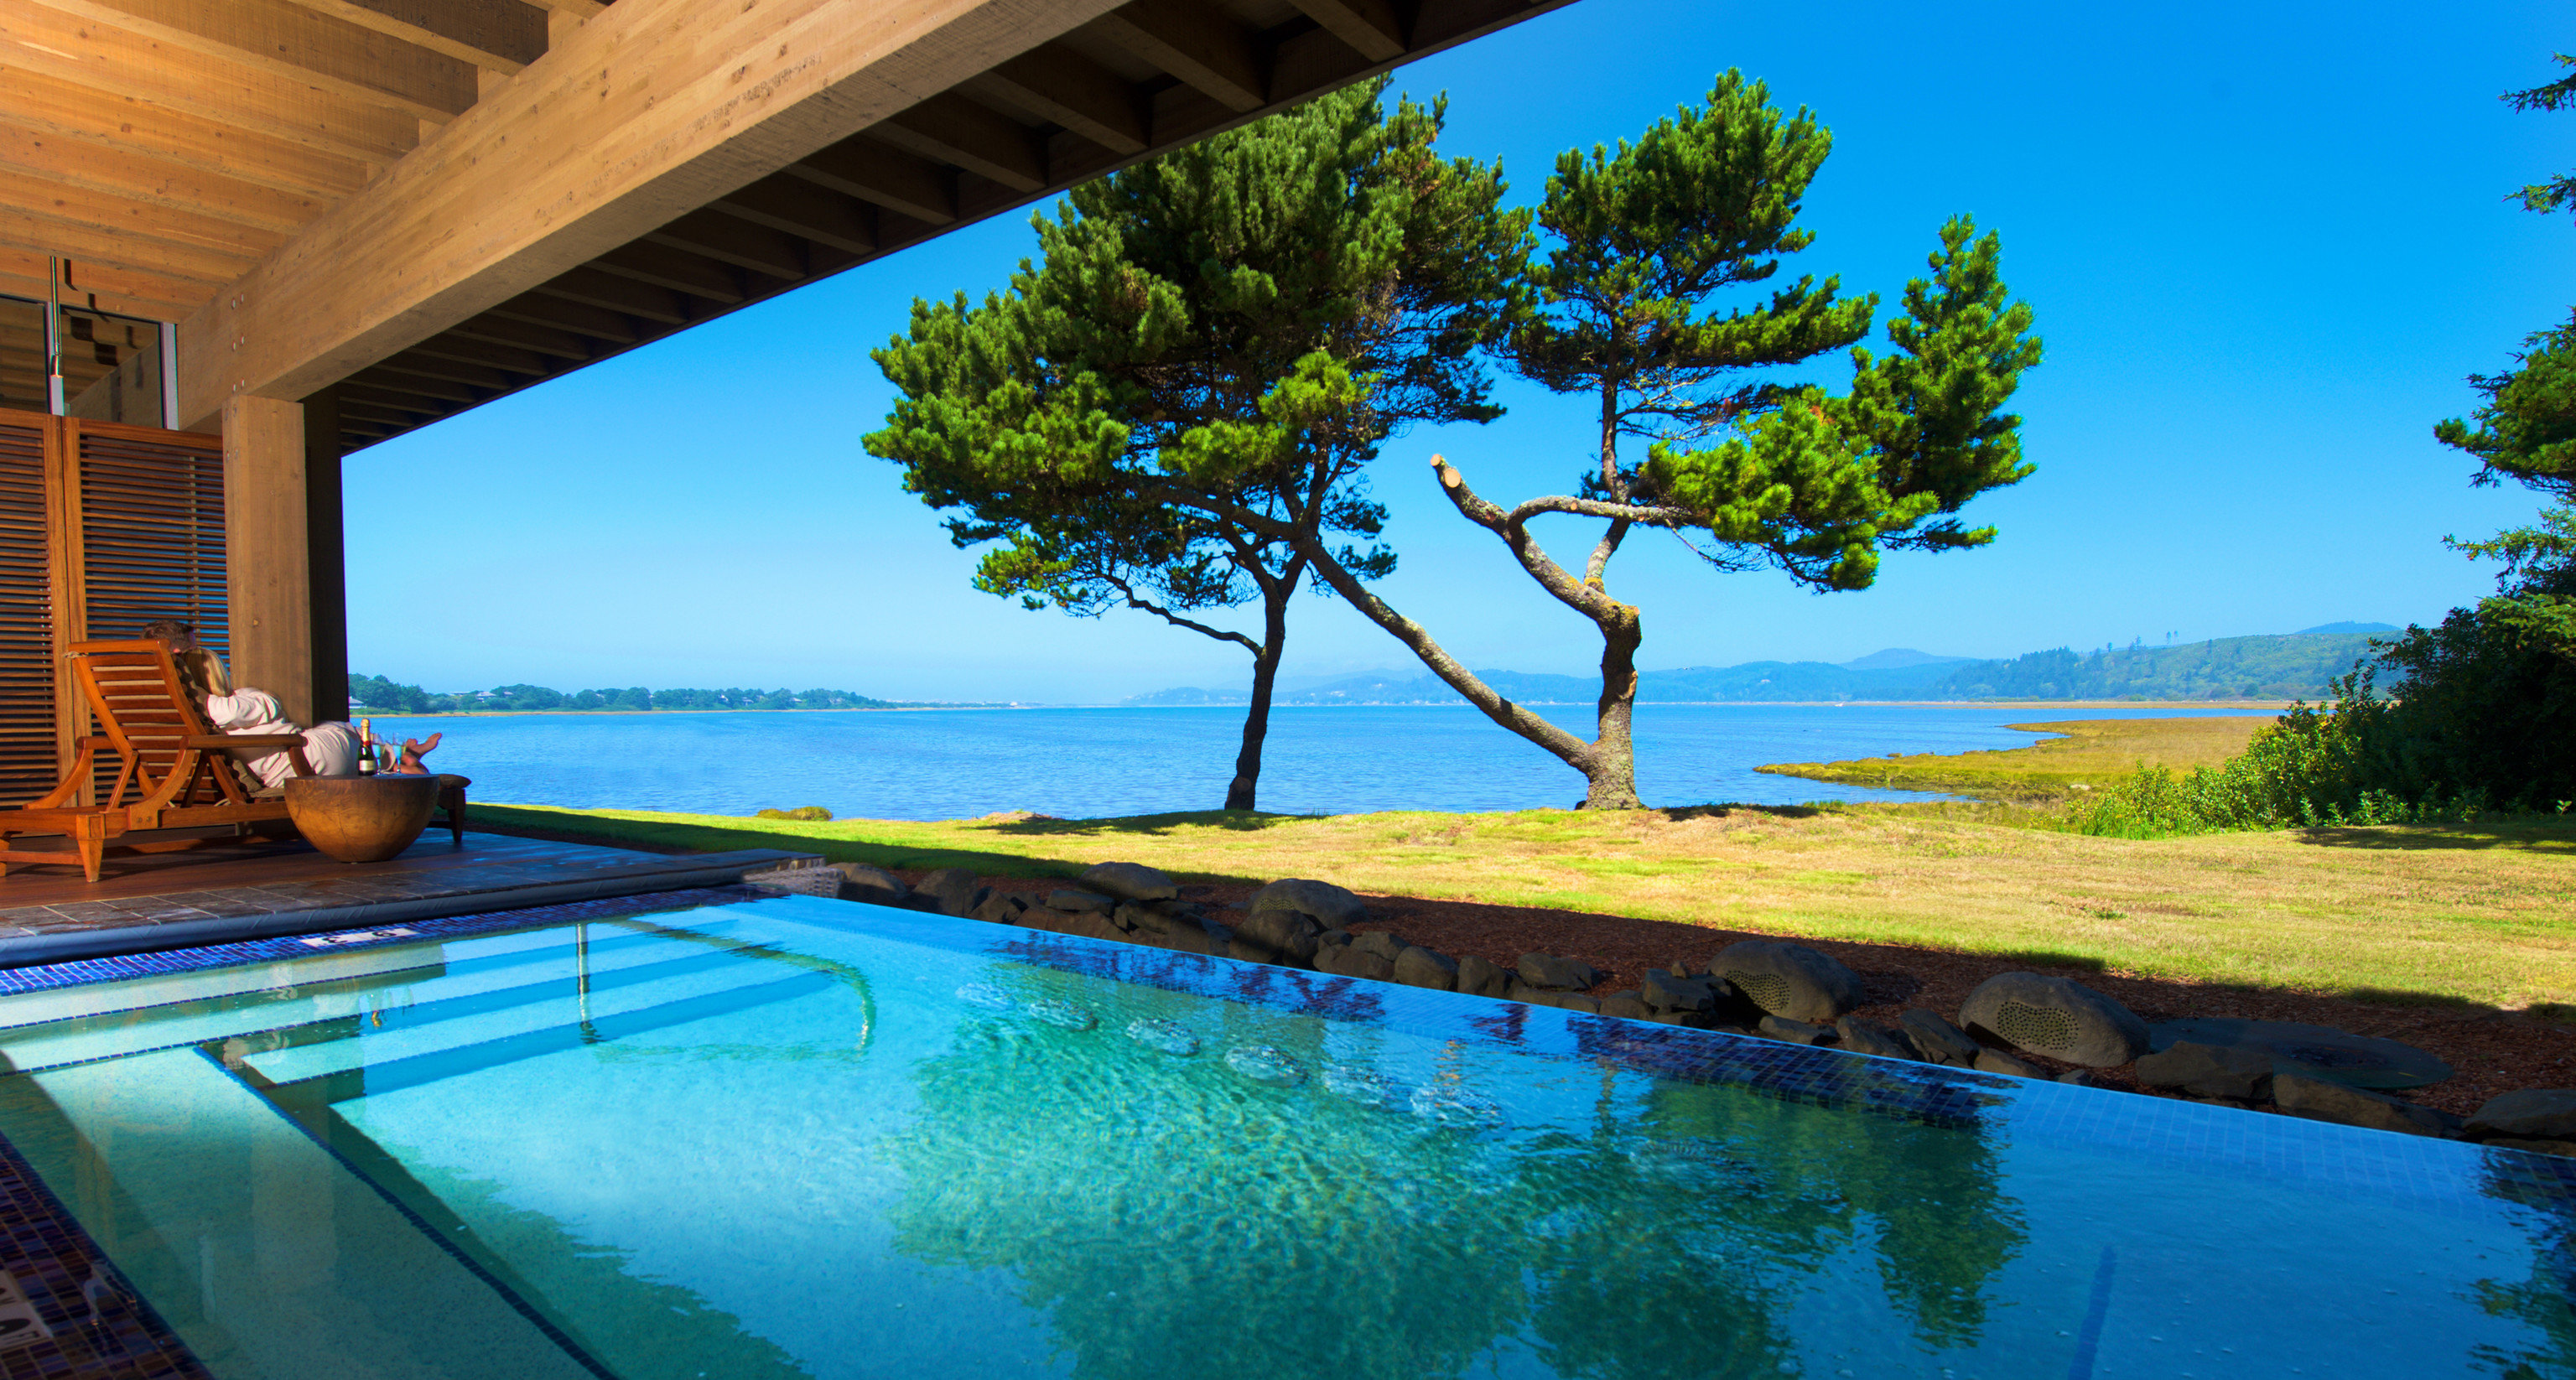 water tree swimming pool property building Resort Villa Sea backyard overlooking Deck Island